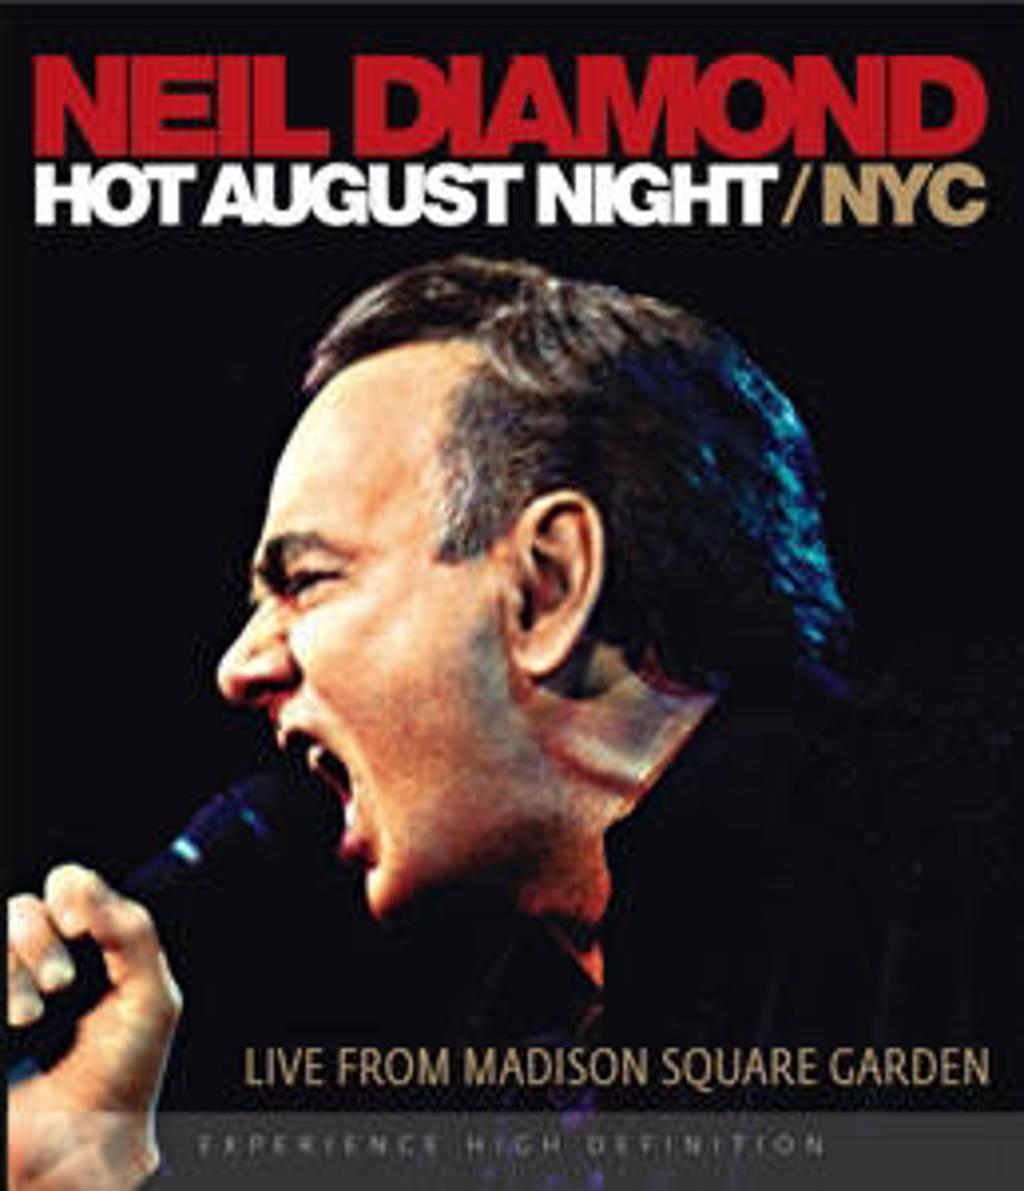 Neil Diamond - Hot August Night / NYC (Blu-ray)